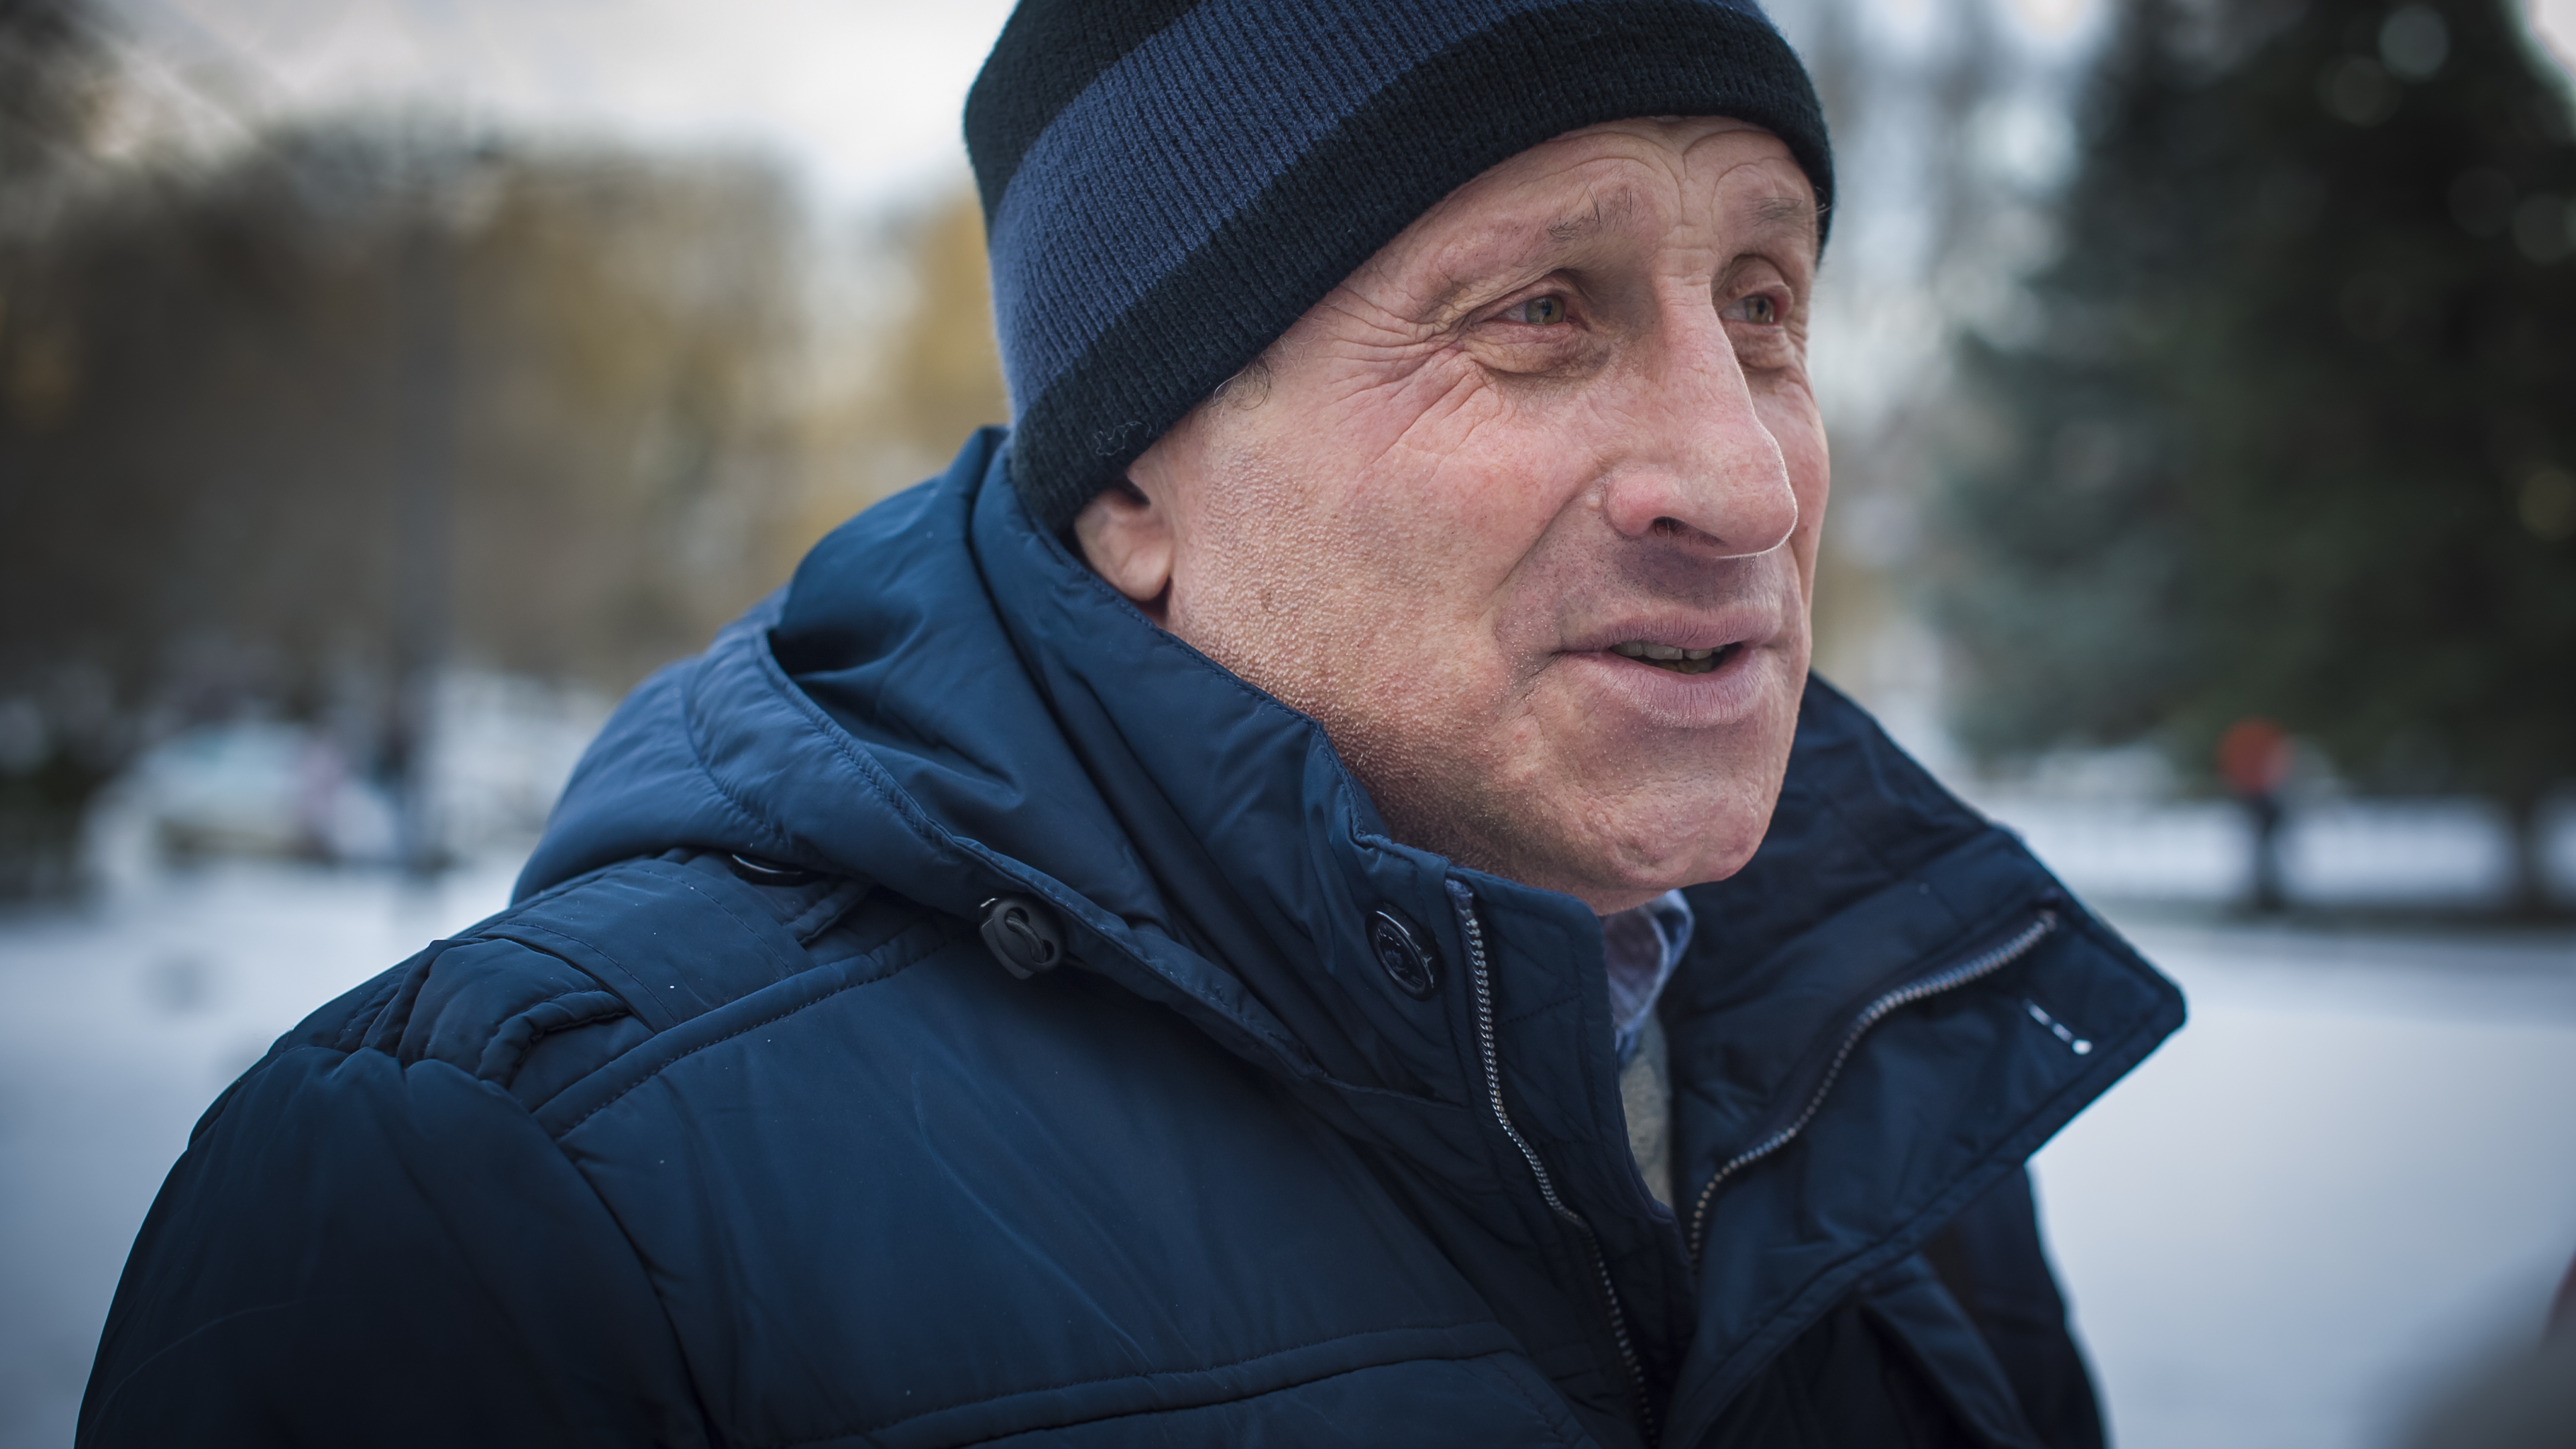 RFE/RL Crimea contributor indicted